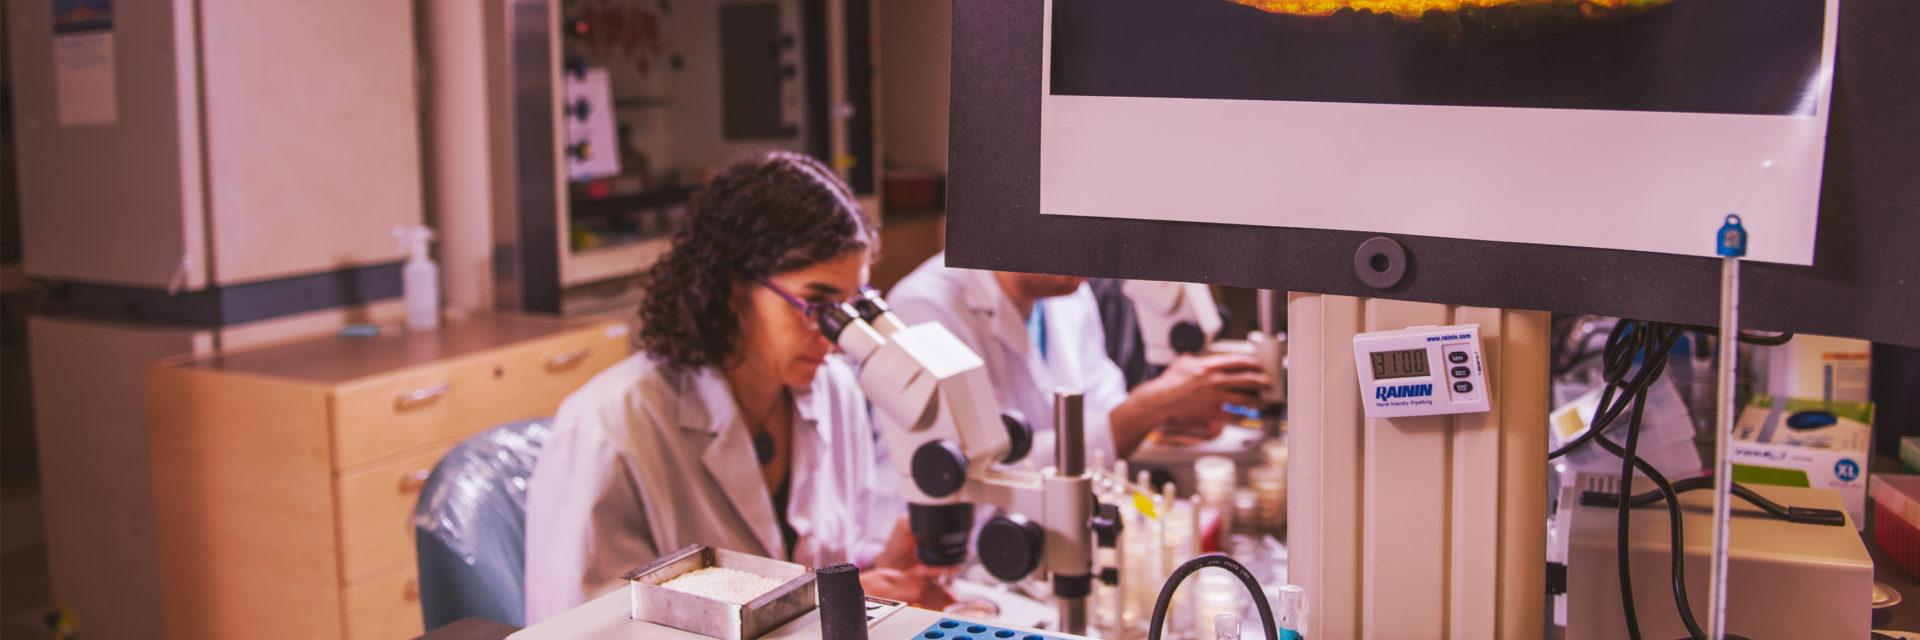 A reseacher using a confocal microscope.